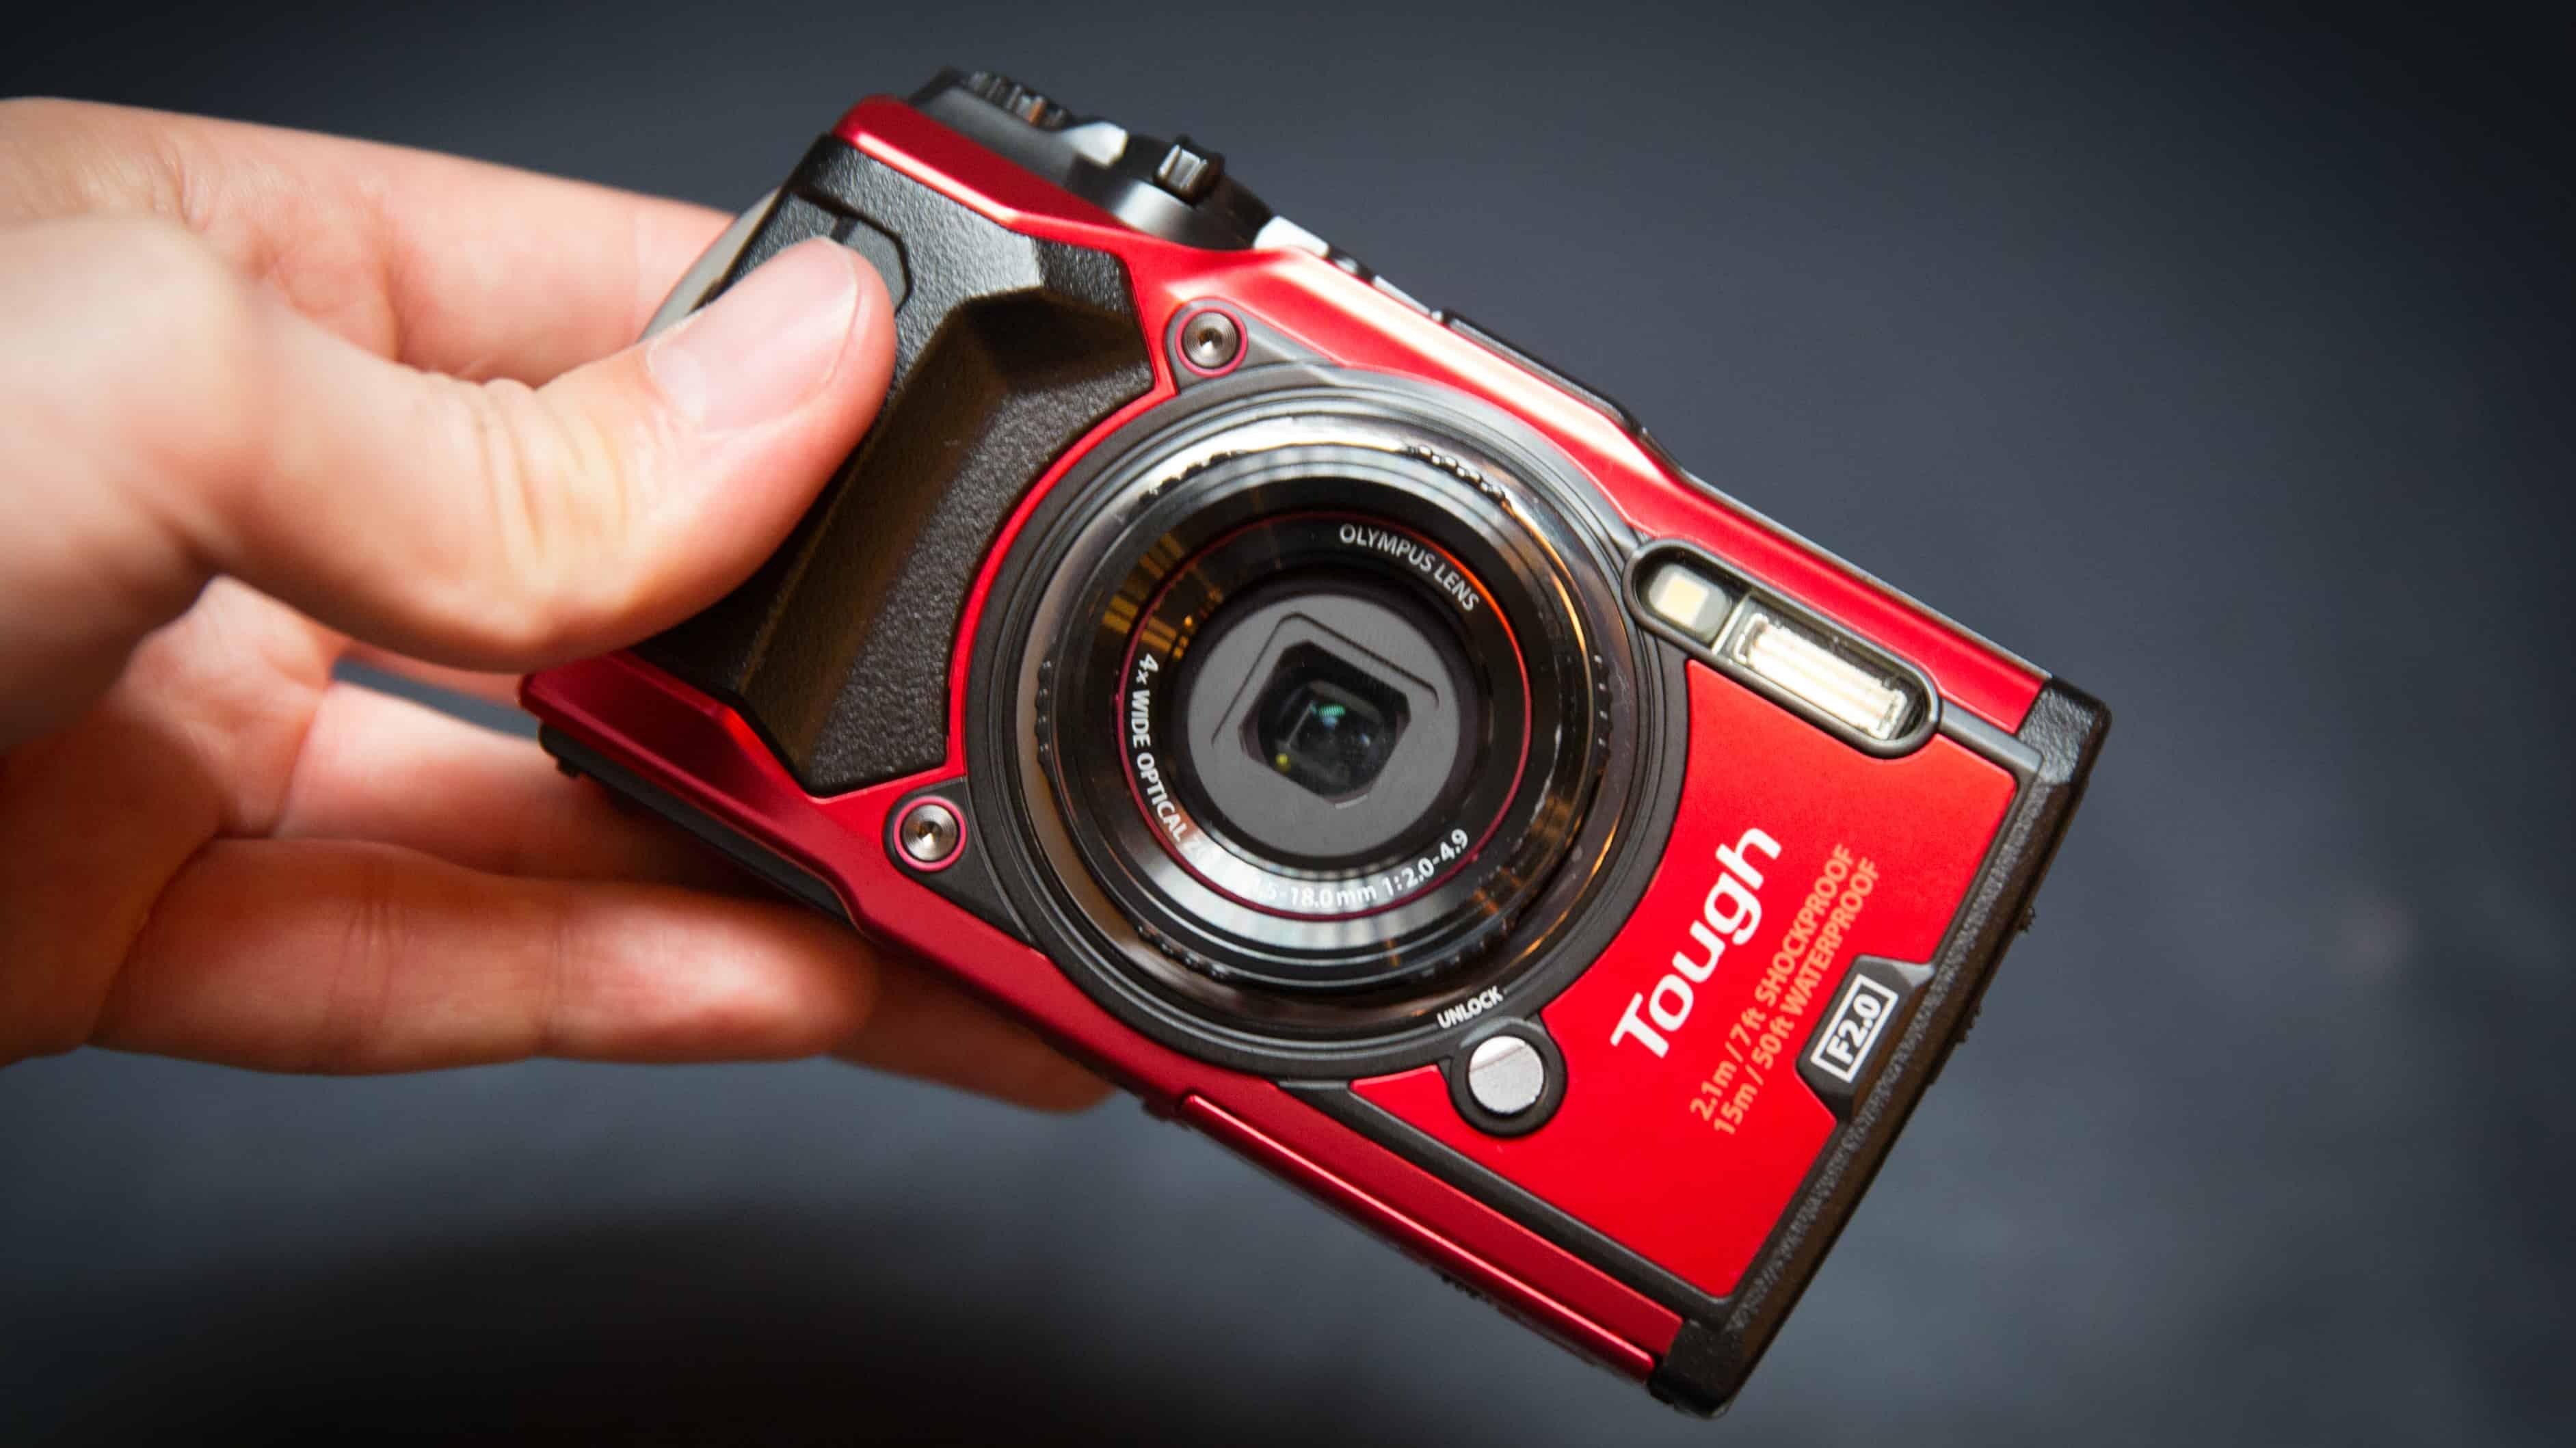 Olympus Tough TG-5 – waterproof camera